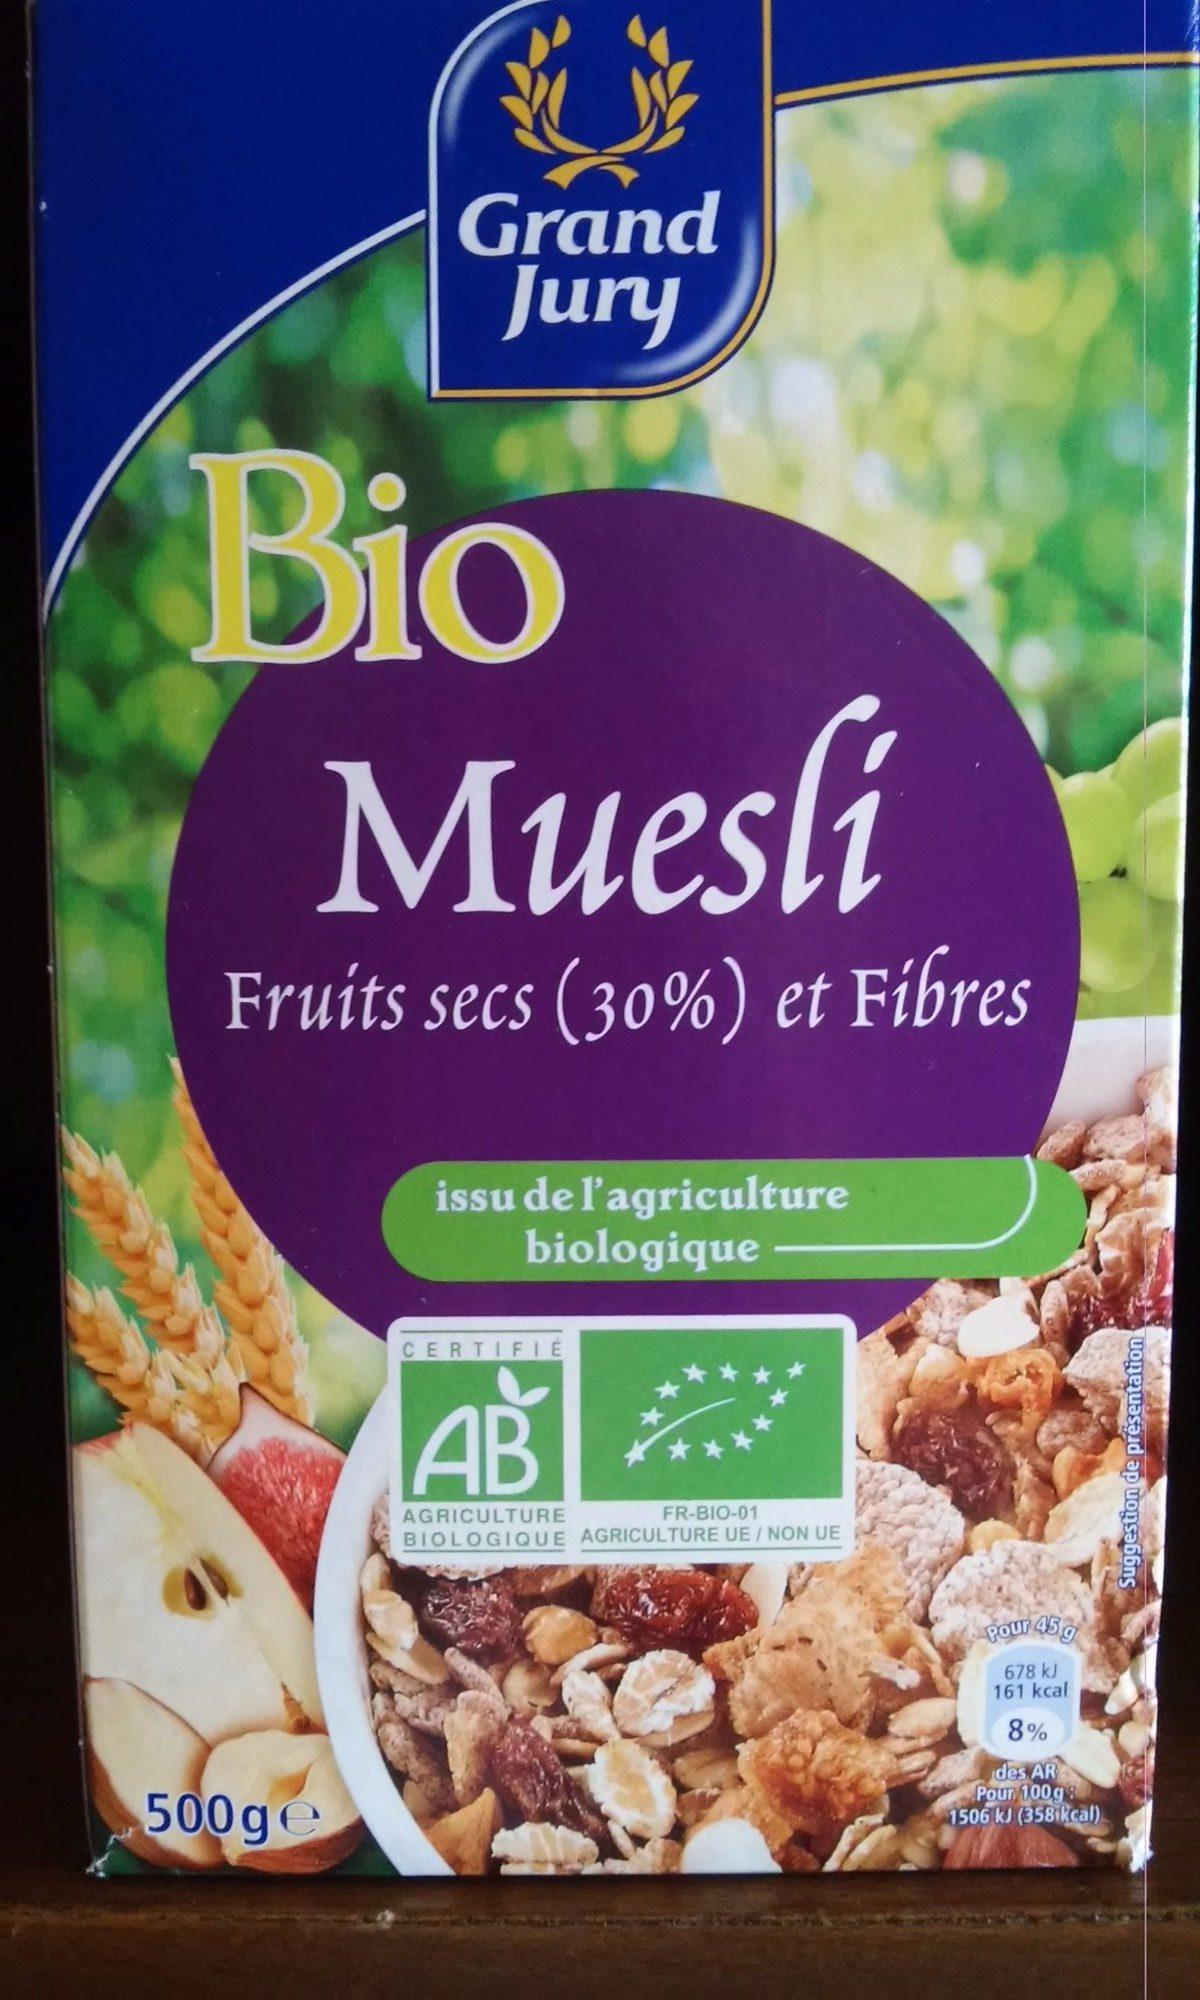 Bio muesli - Product